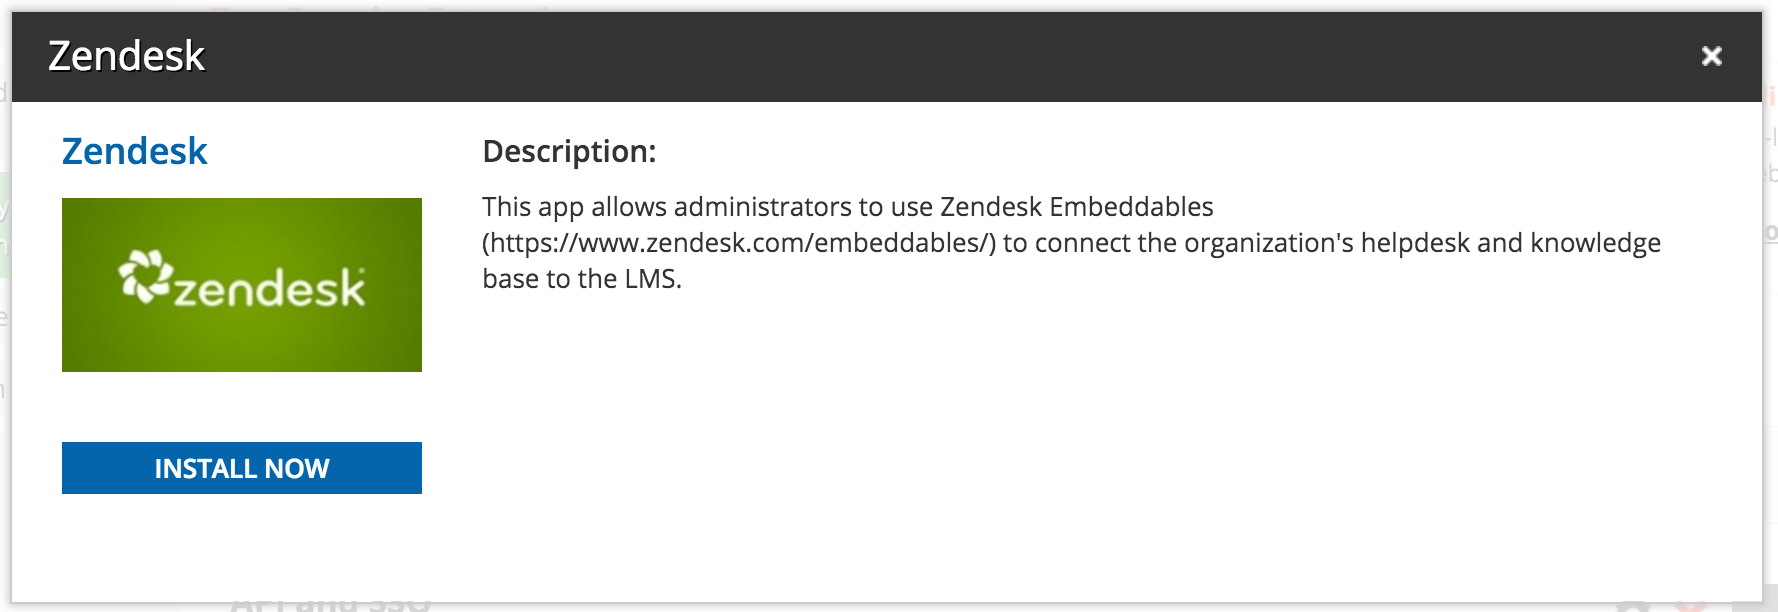 Install now Zendesk